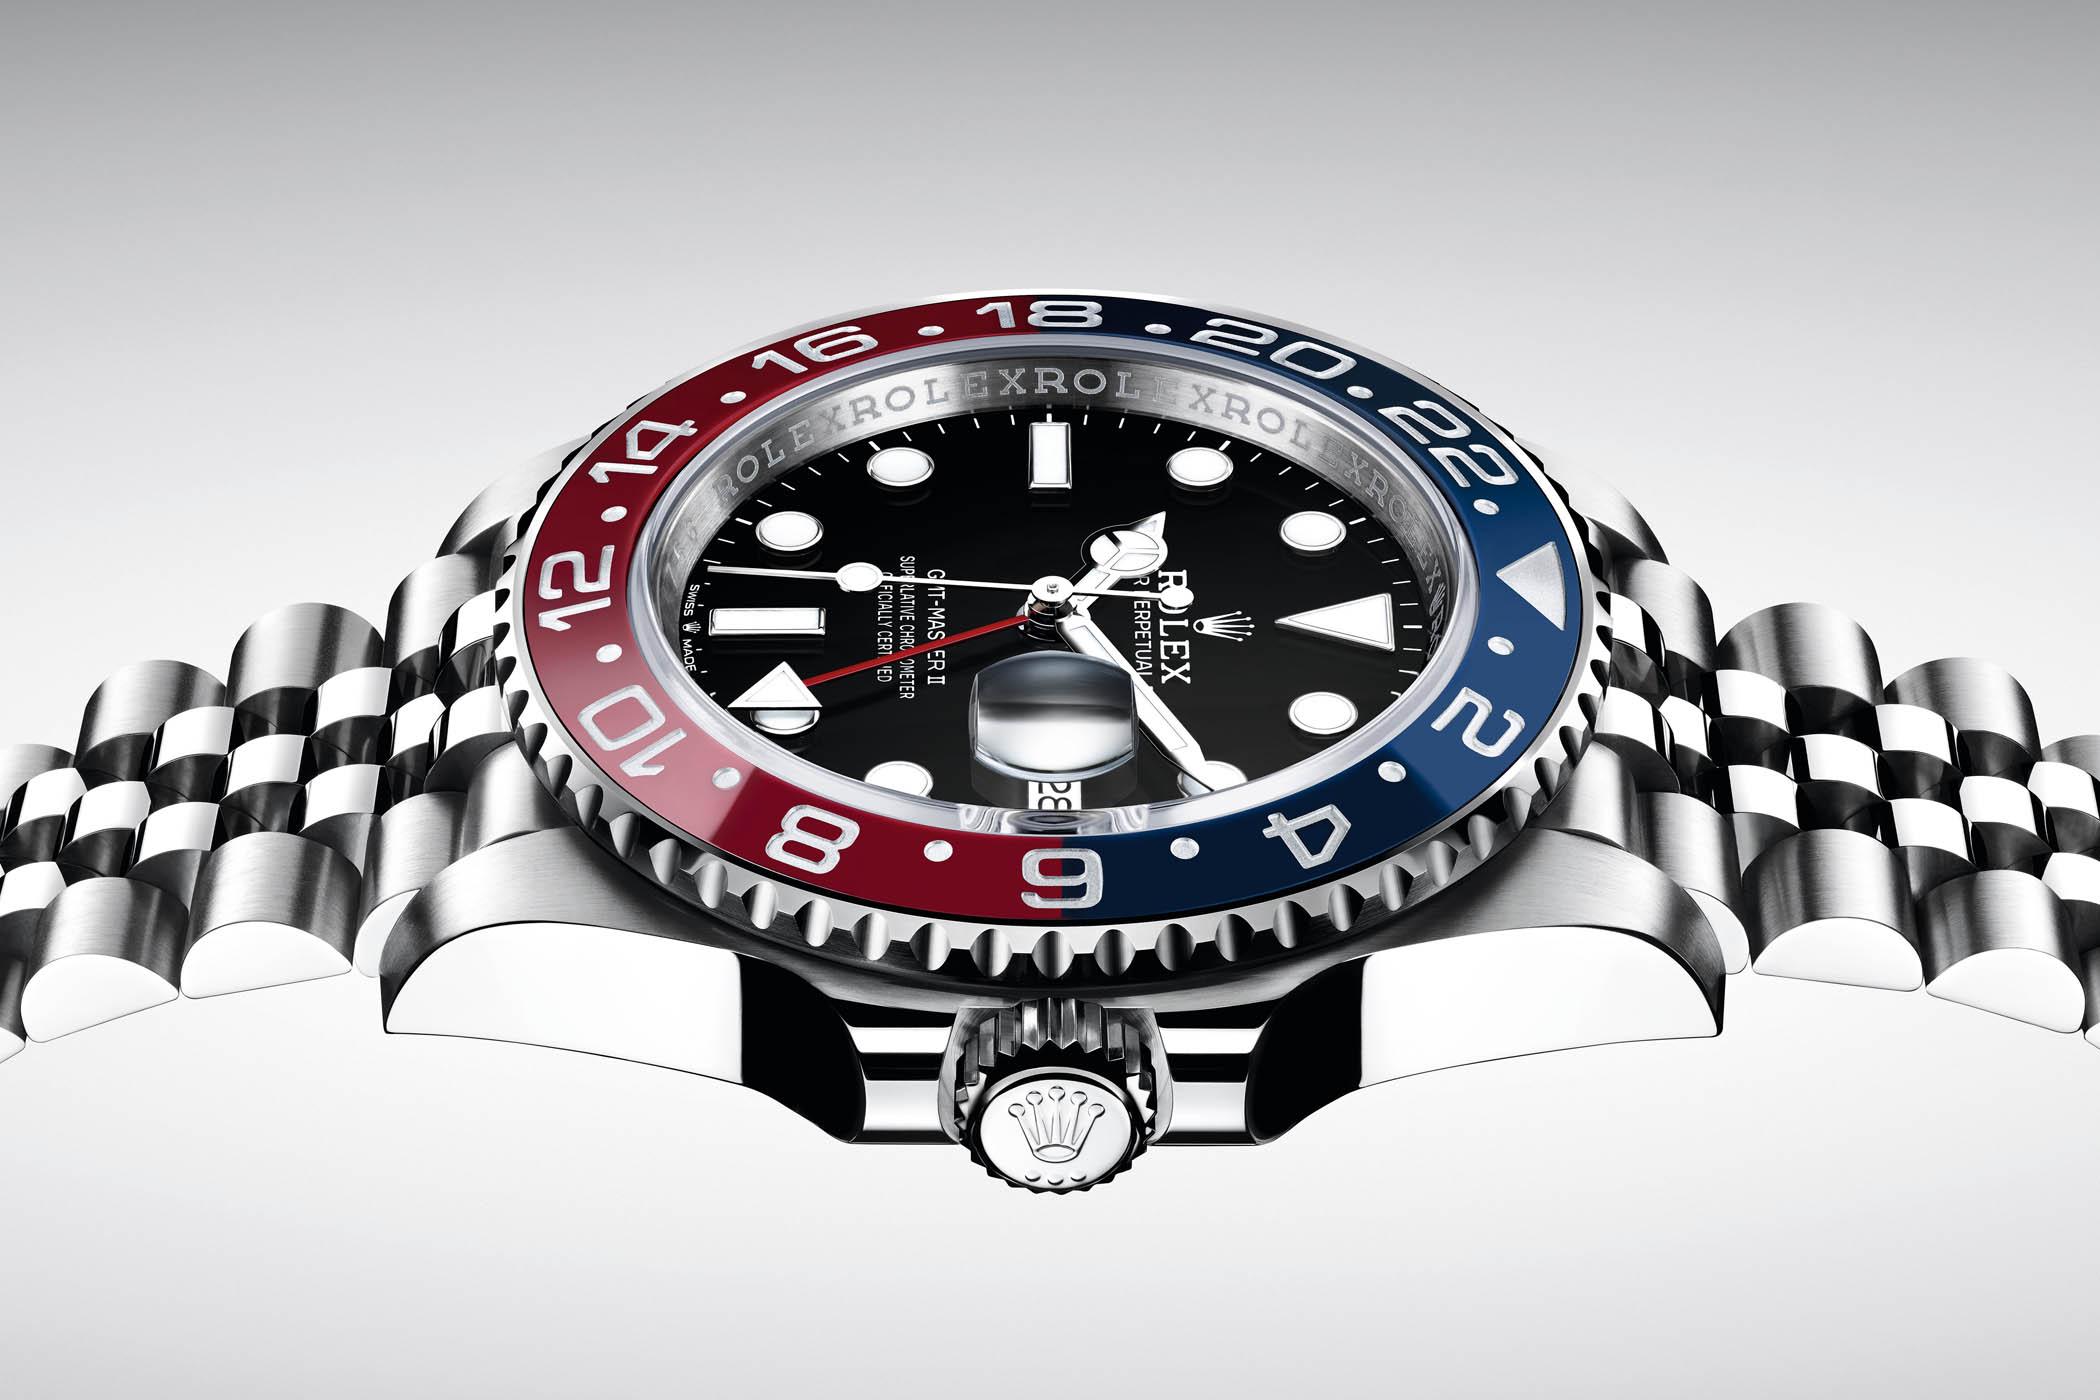 Rolex GMT Master II Pepsi 126710 BLRO Steel Jubilee Calibre 3285 - Baselworld 2018